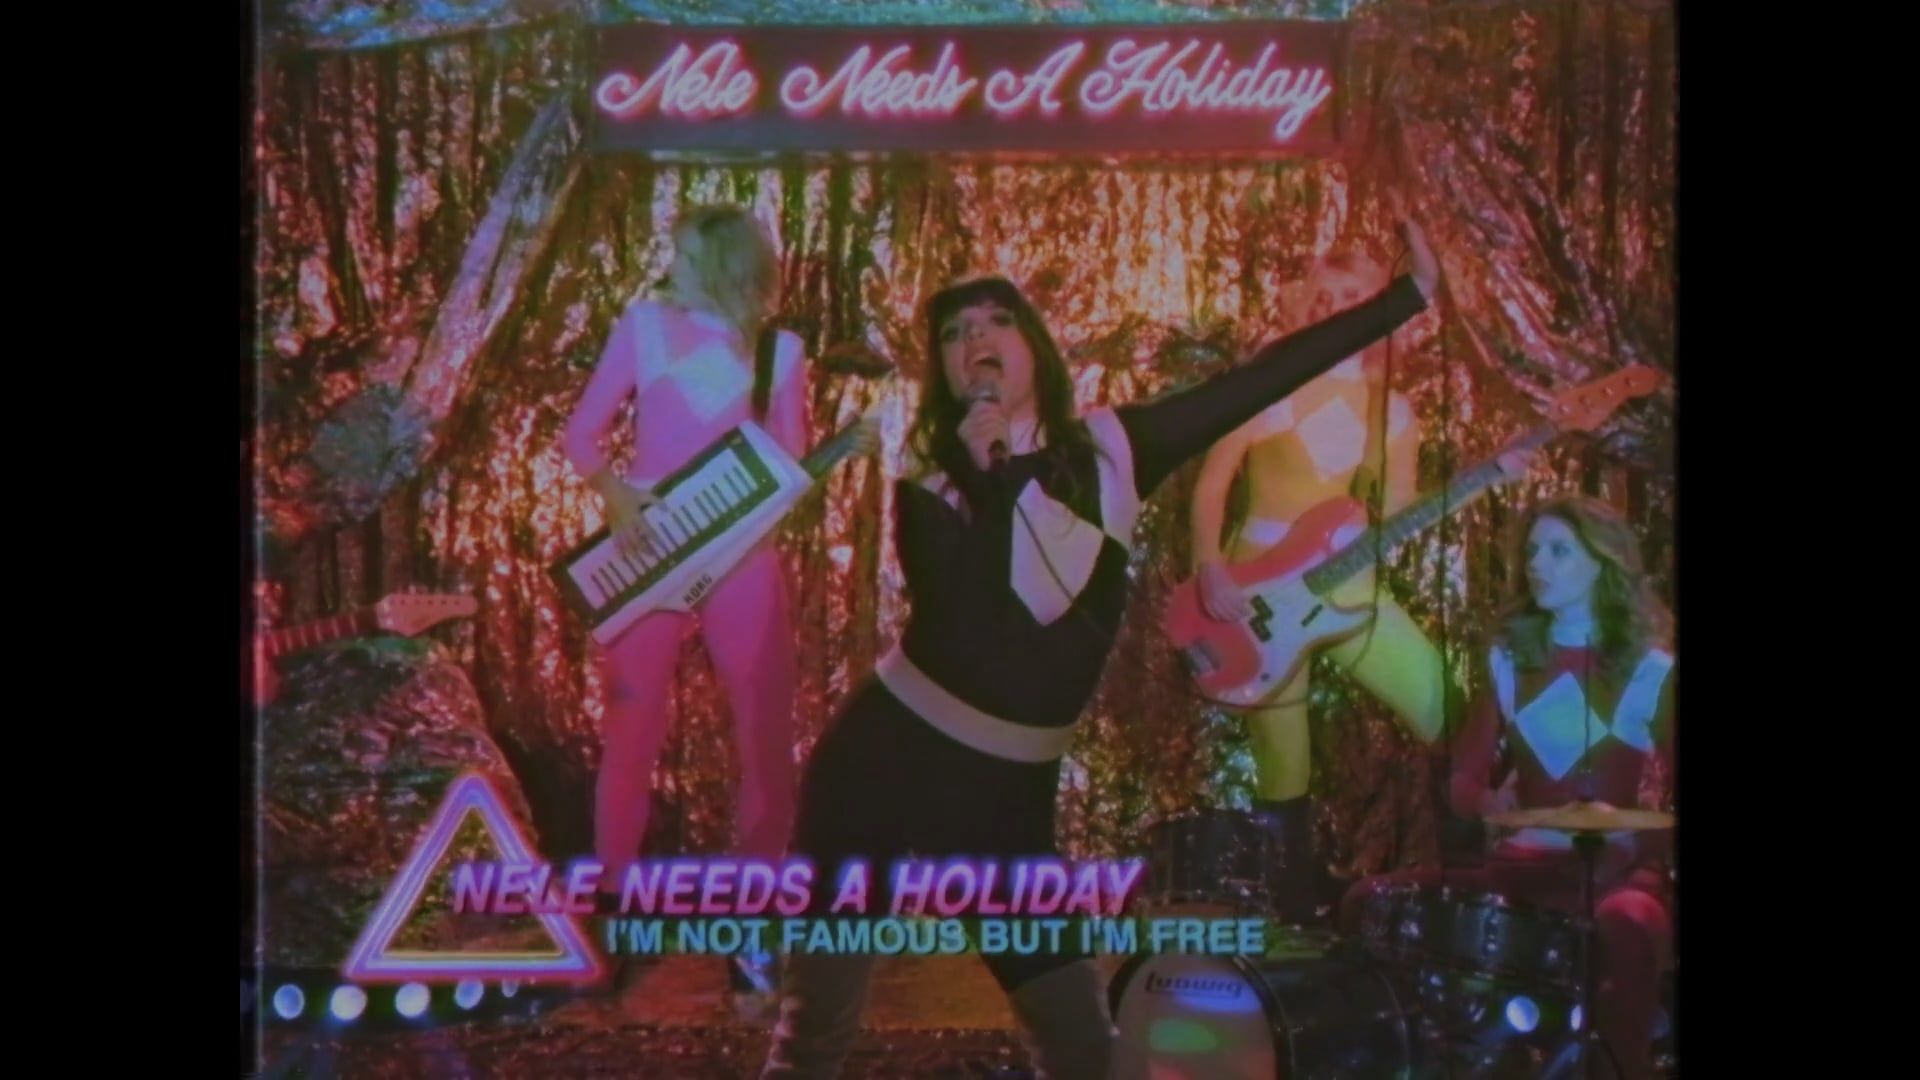 NELE NEEDS A HOLIDAY / I'M NOT FAMOUS BUT I'M FREE